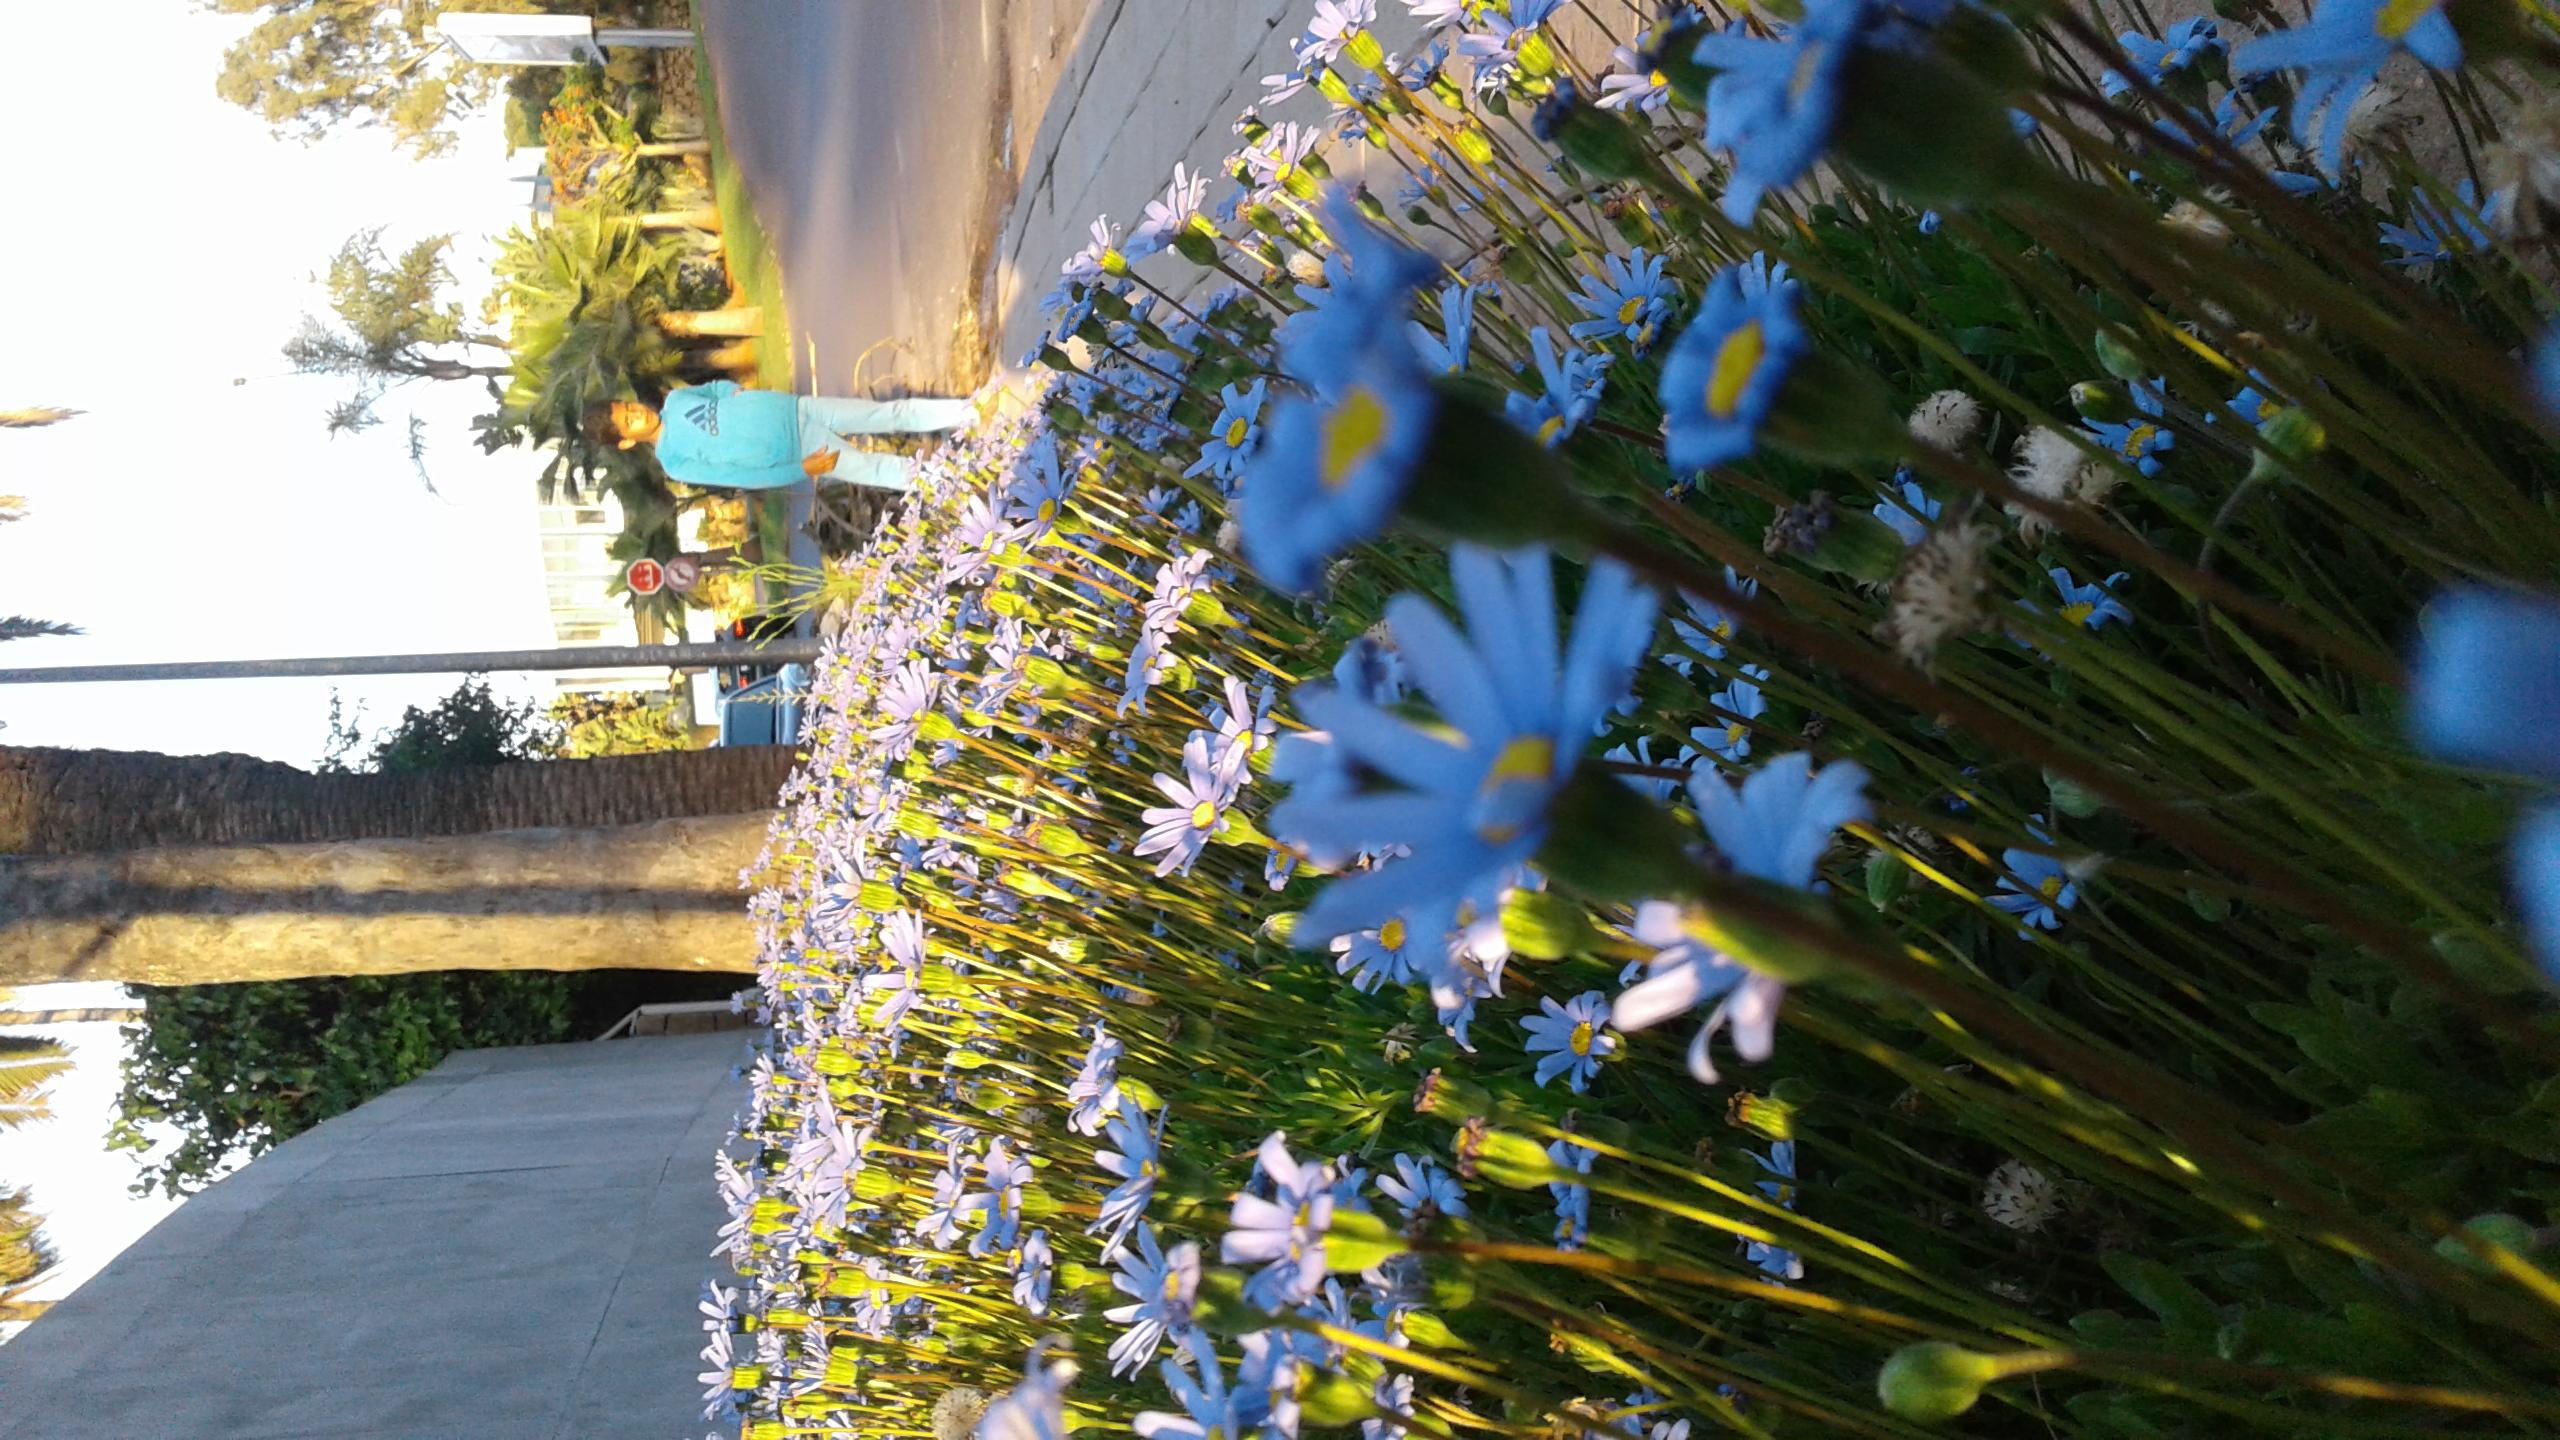 Filepurple jasmine flower and cousing wikimedia commons filepurple jasmine flower and cousing izmirmasajfo